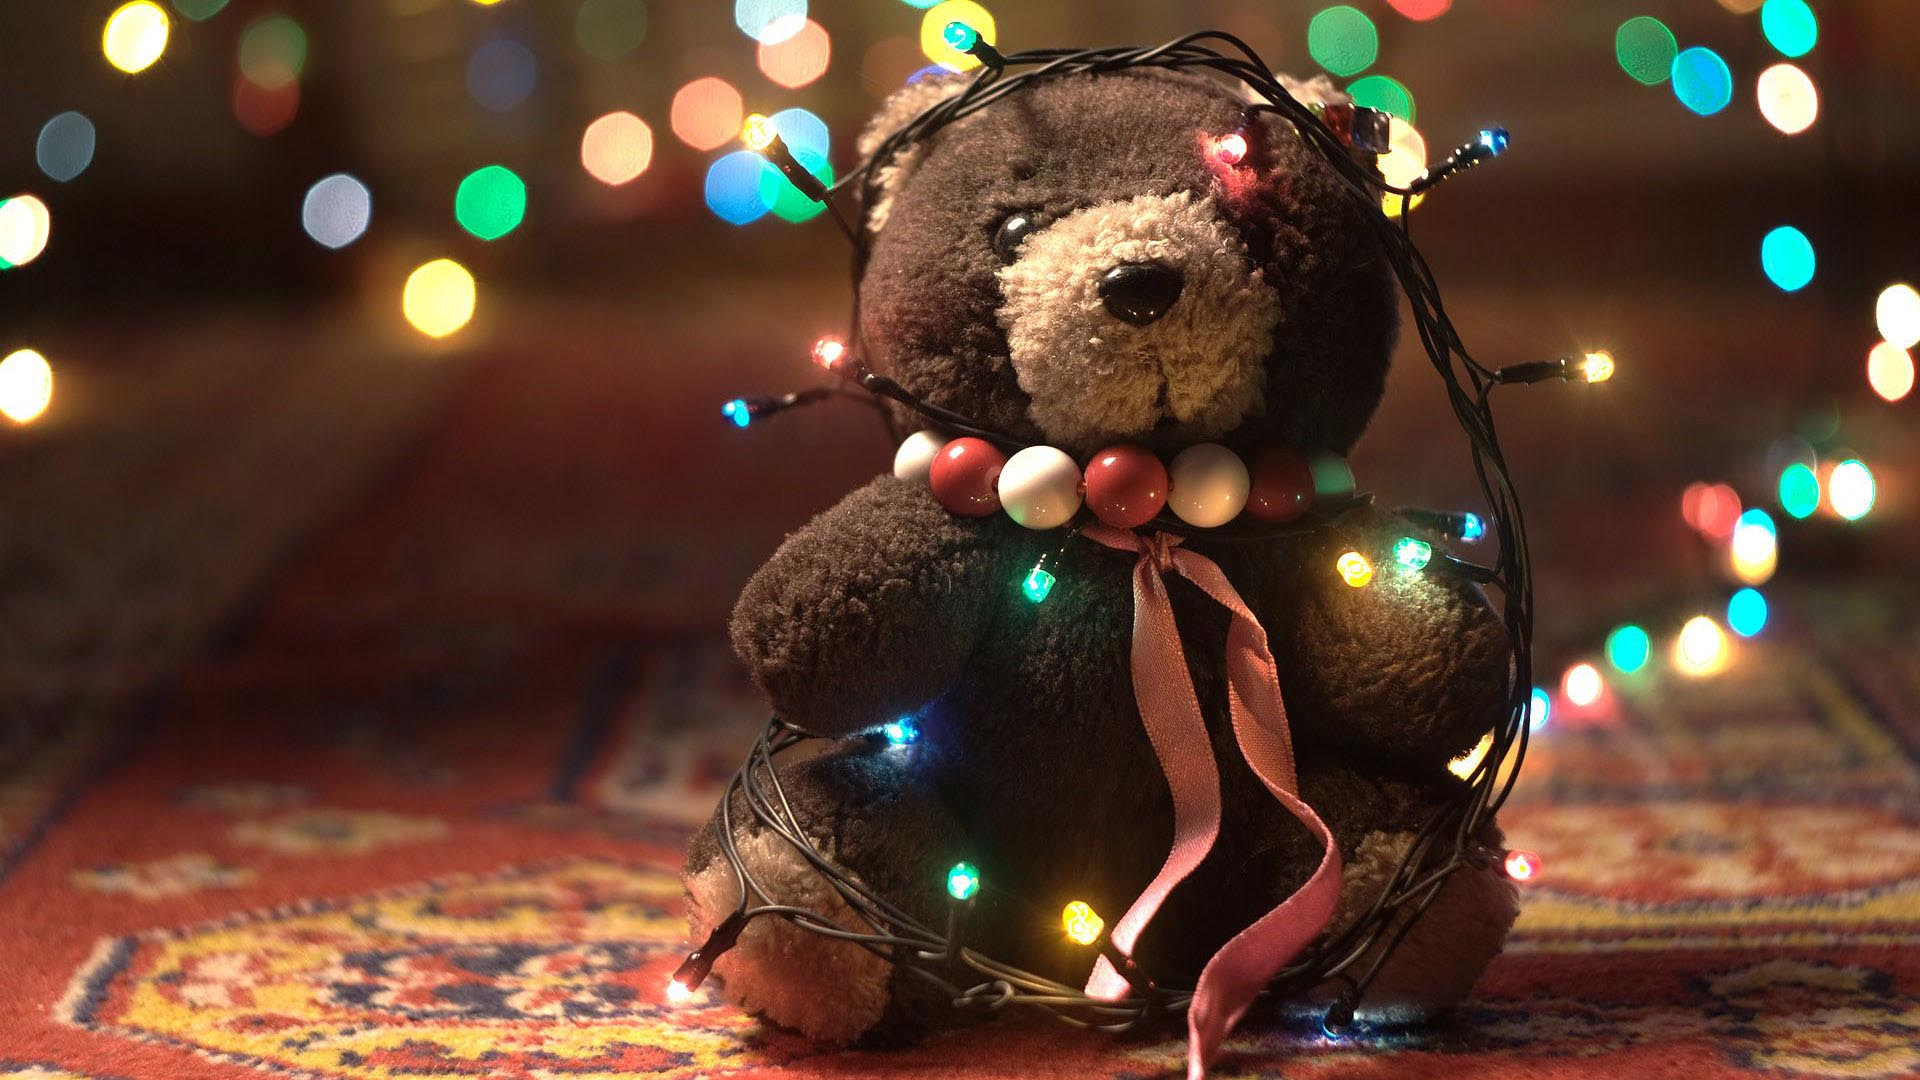 Cute Christmas Lights